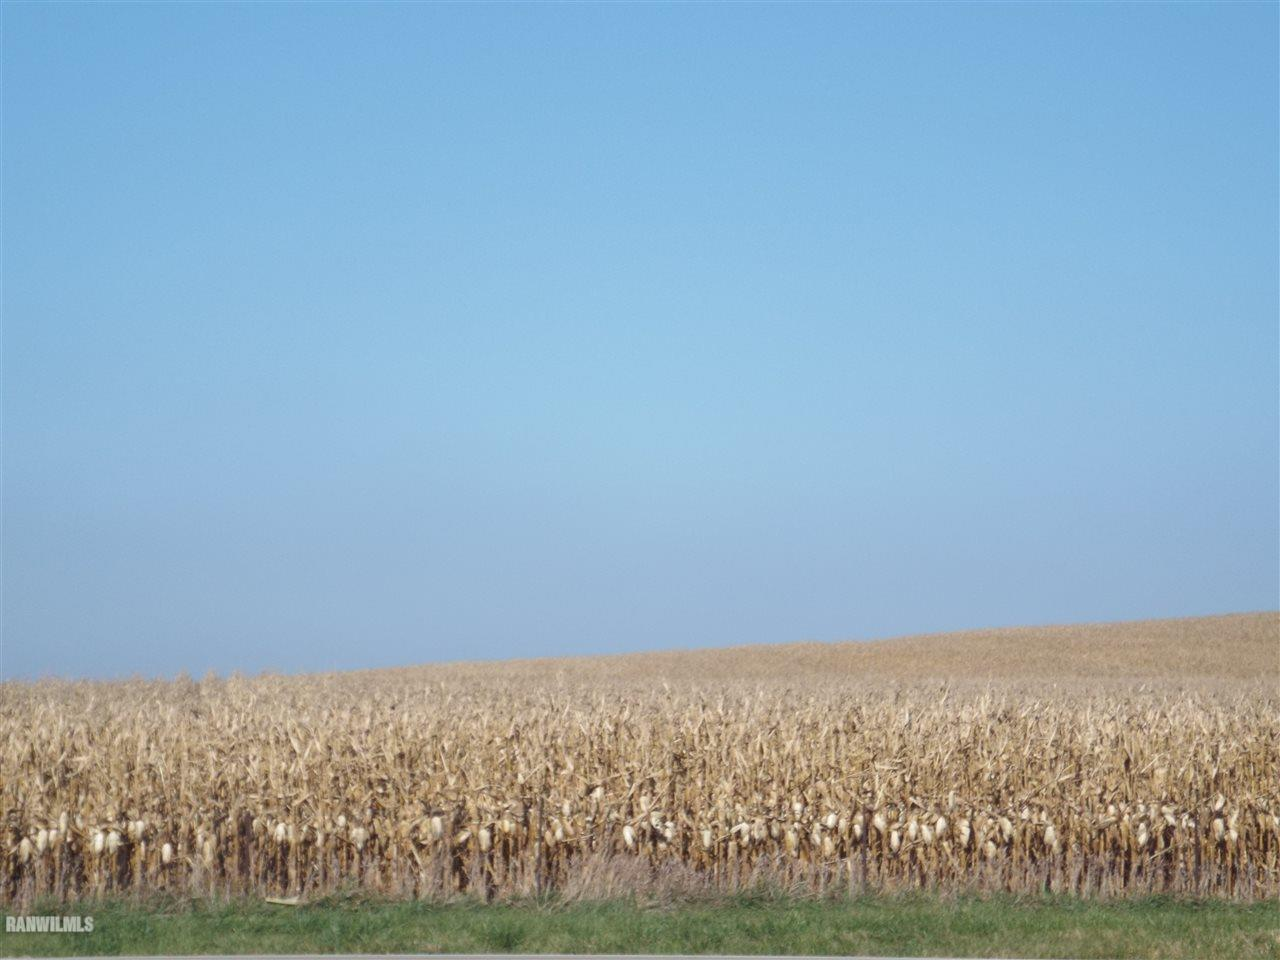 Image of Acreage for Sale near Galena, Illinois, in Jo Daviess County: 94 acres